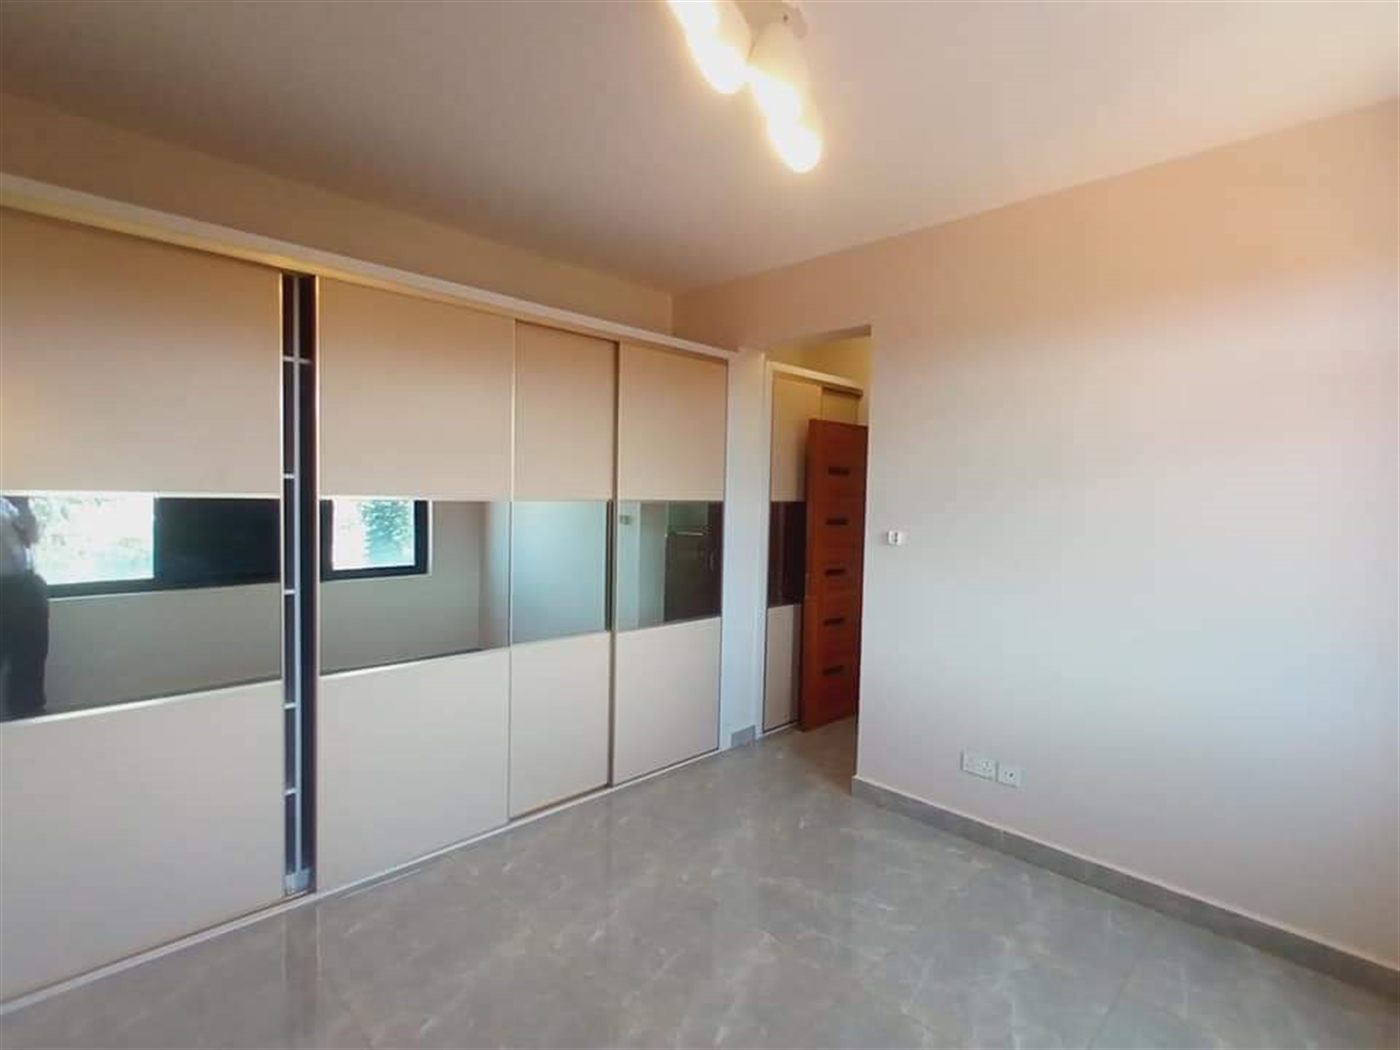 Apartment for rent in Kansanga Kampala